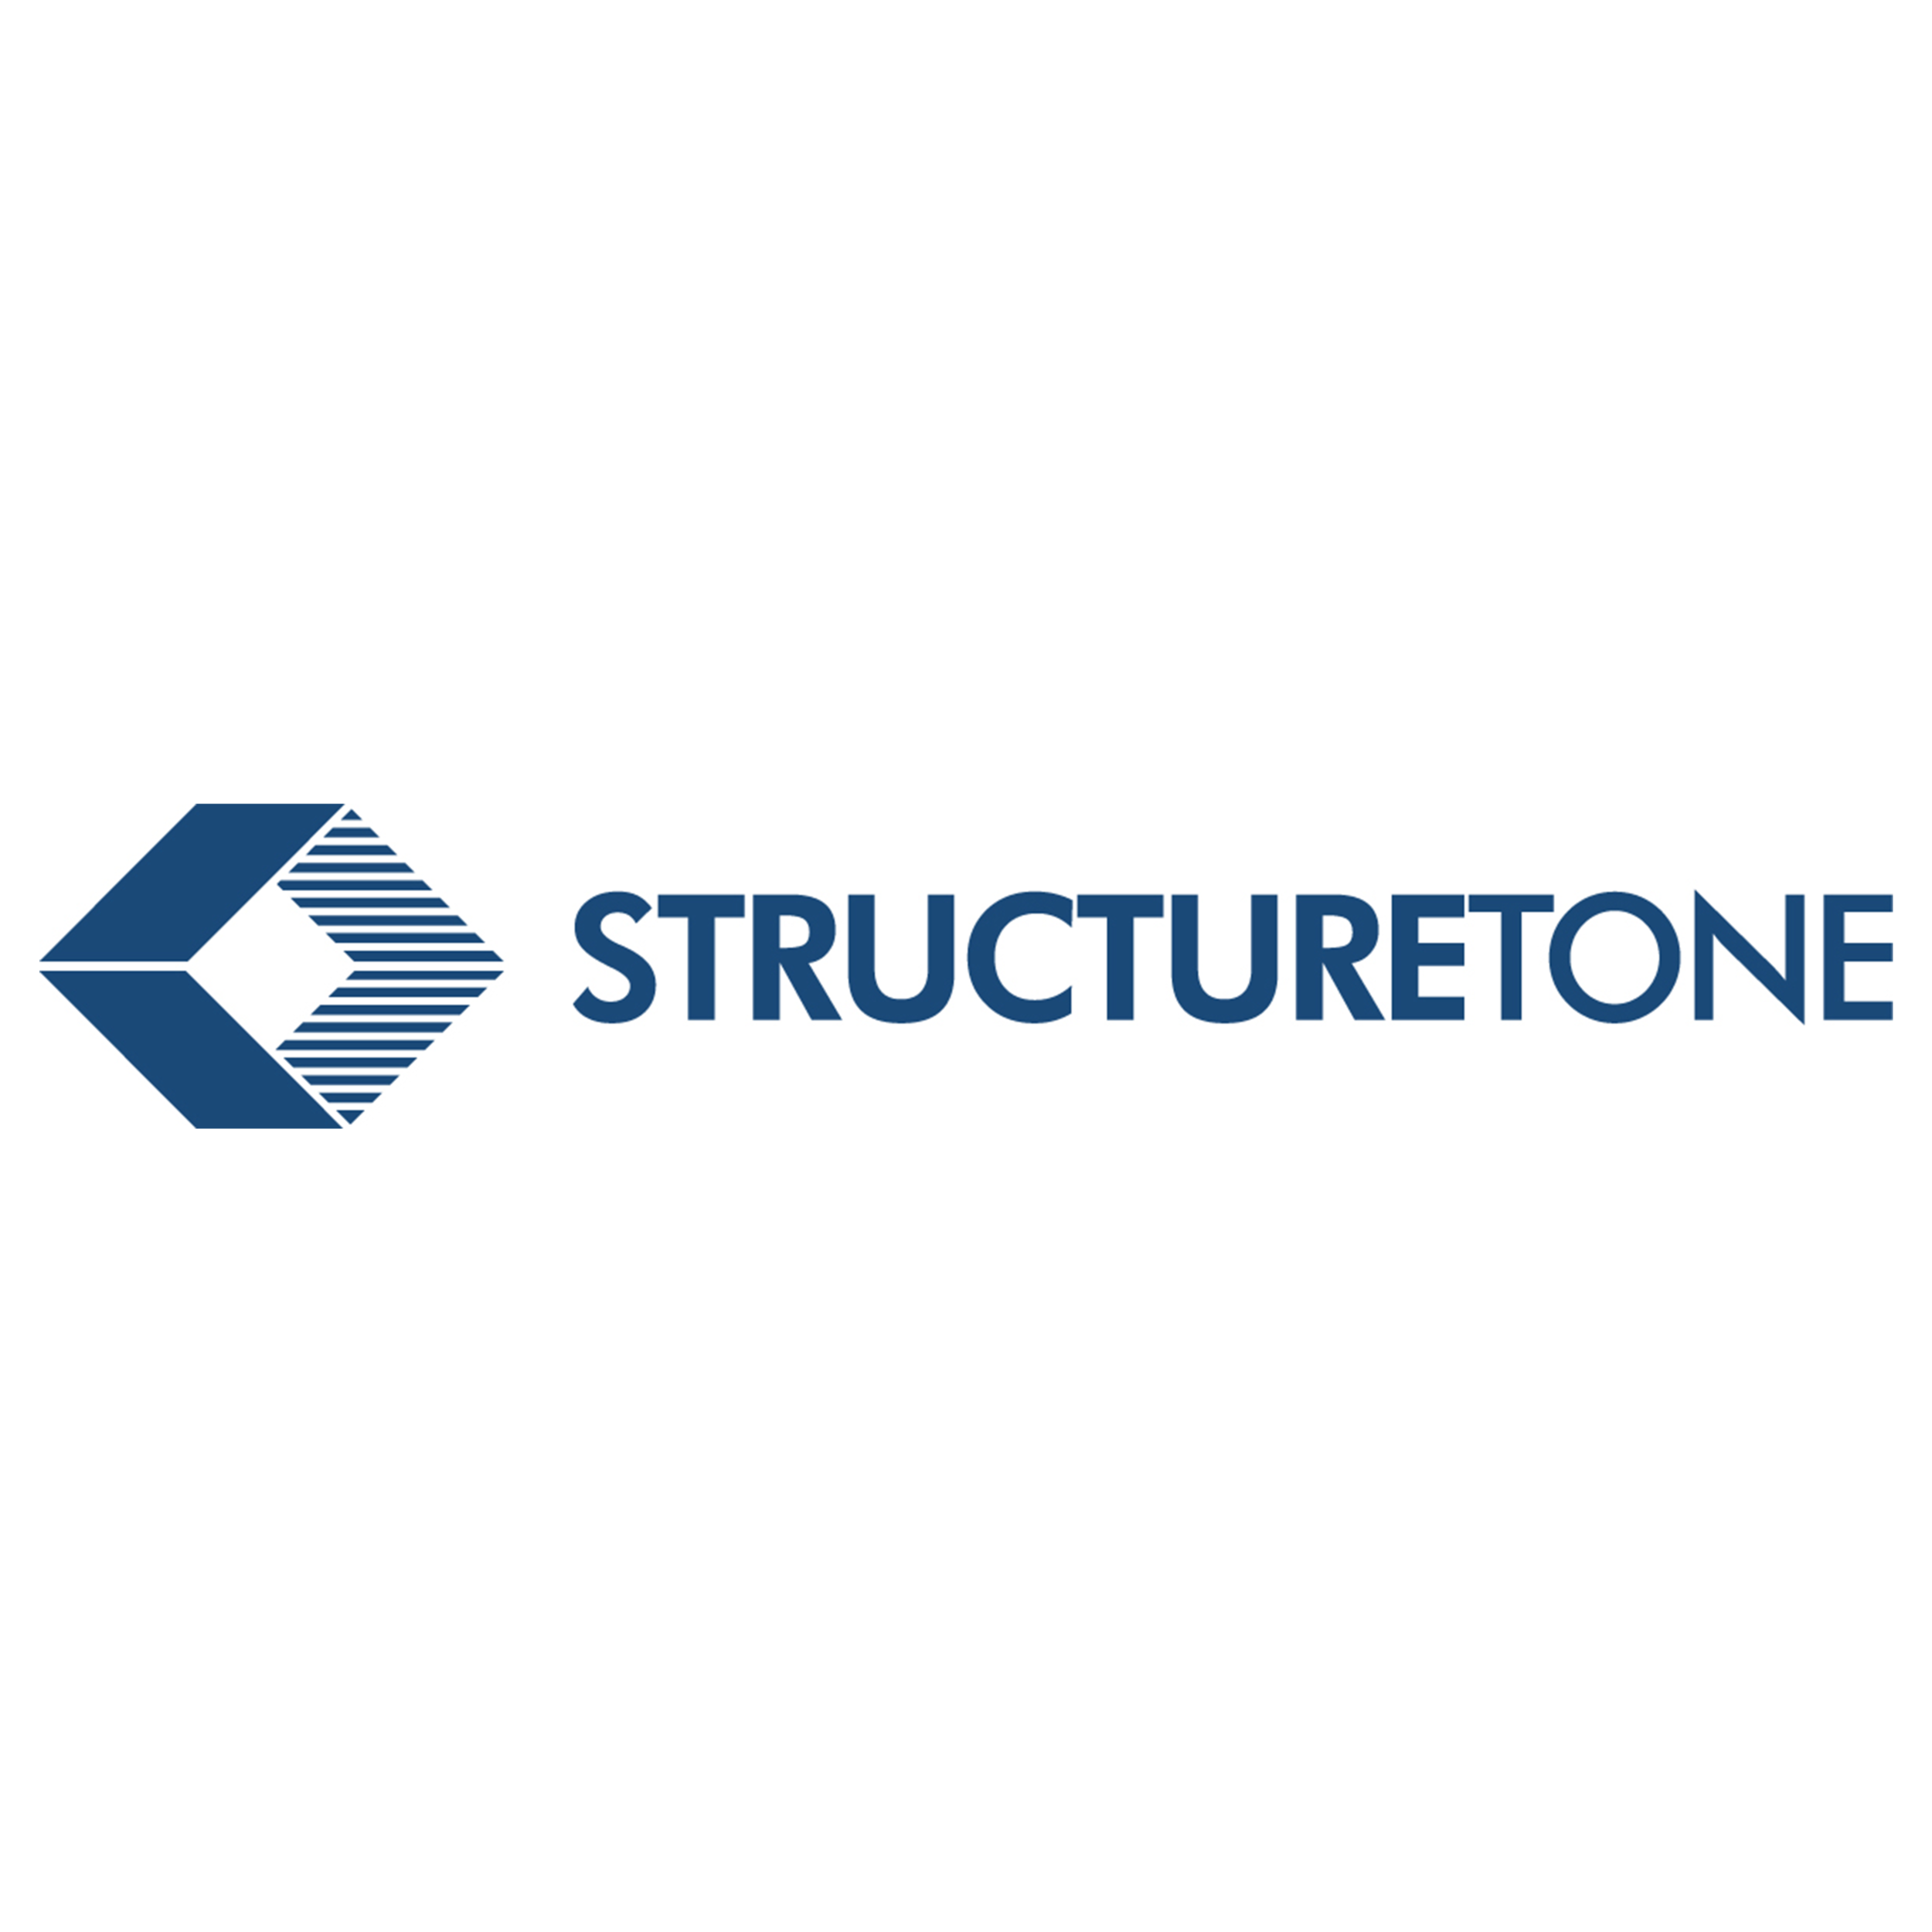 structuretone.png